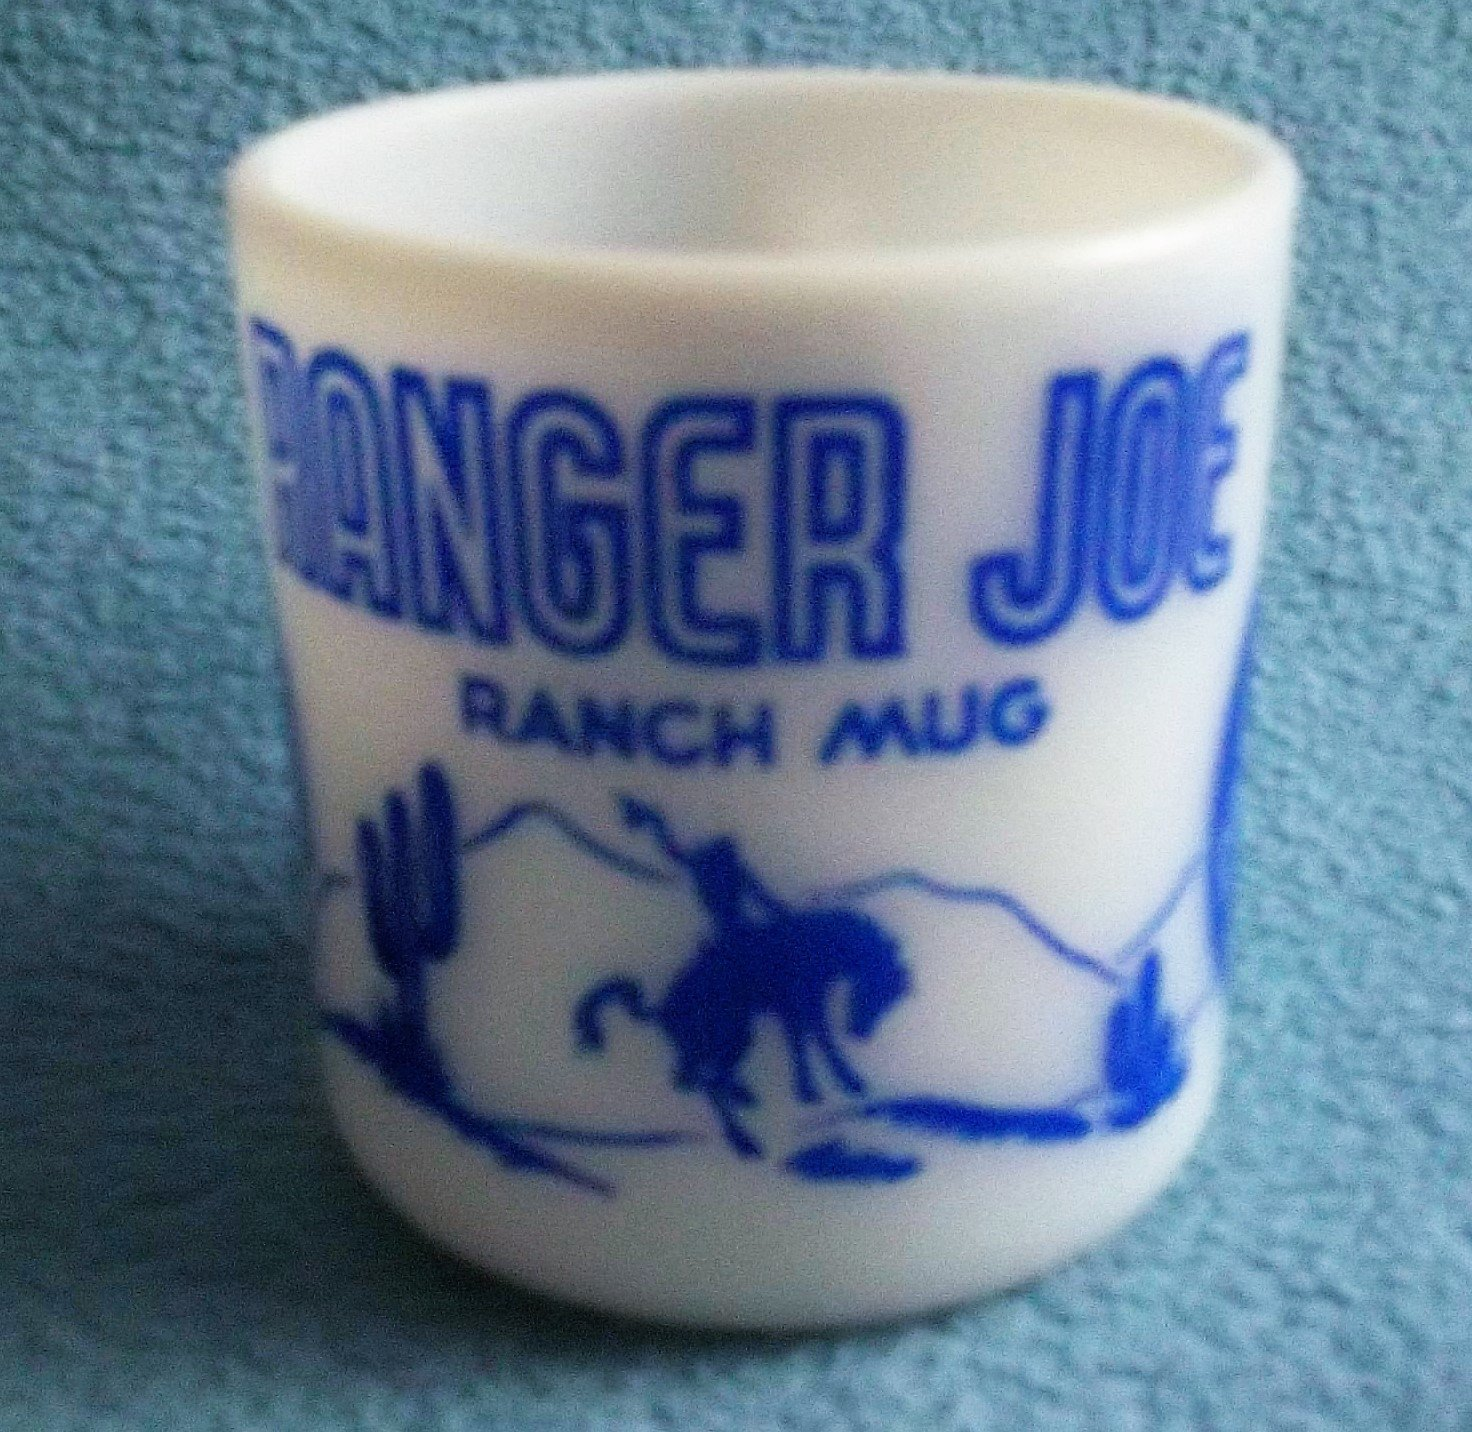 Vintage Child's RANGER JOE RANCH MUG 50's Cowboy BLUE/WHITE Hazel Atlas Milk Glass